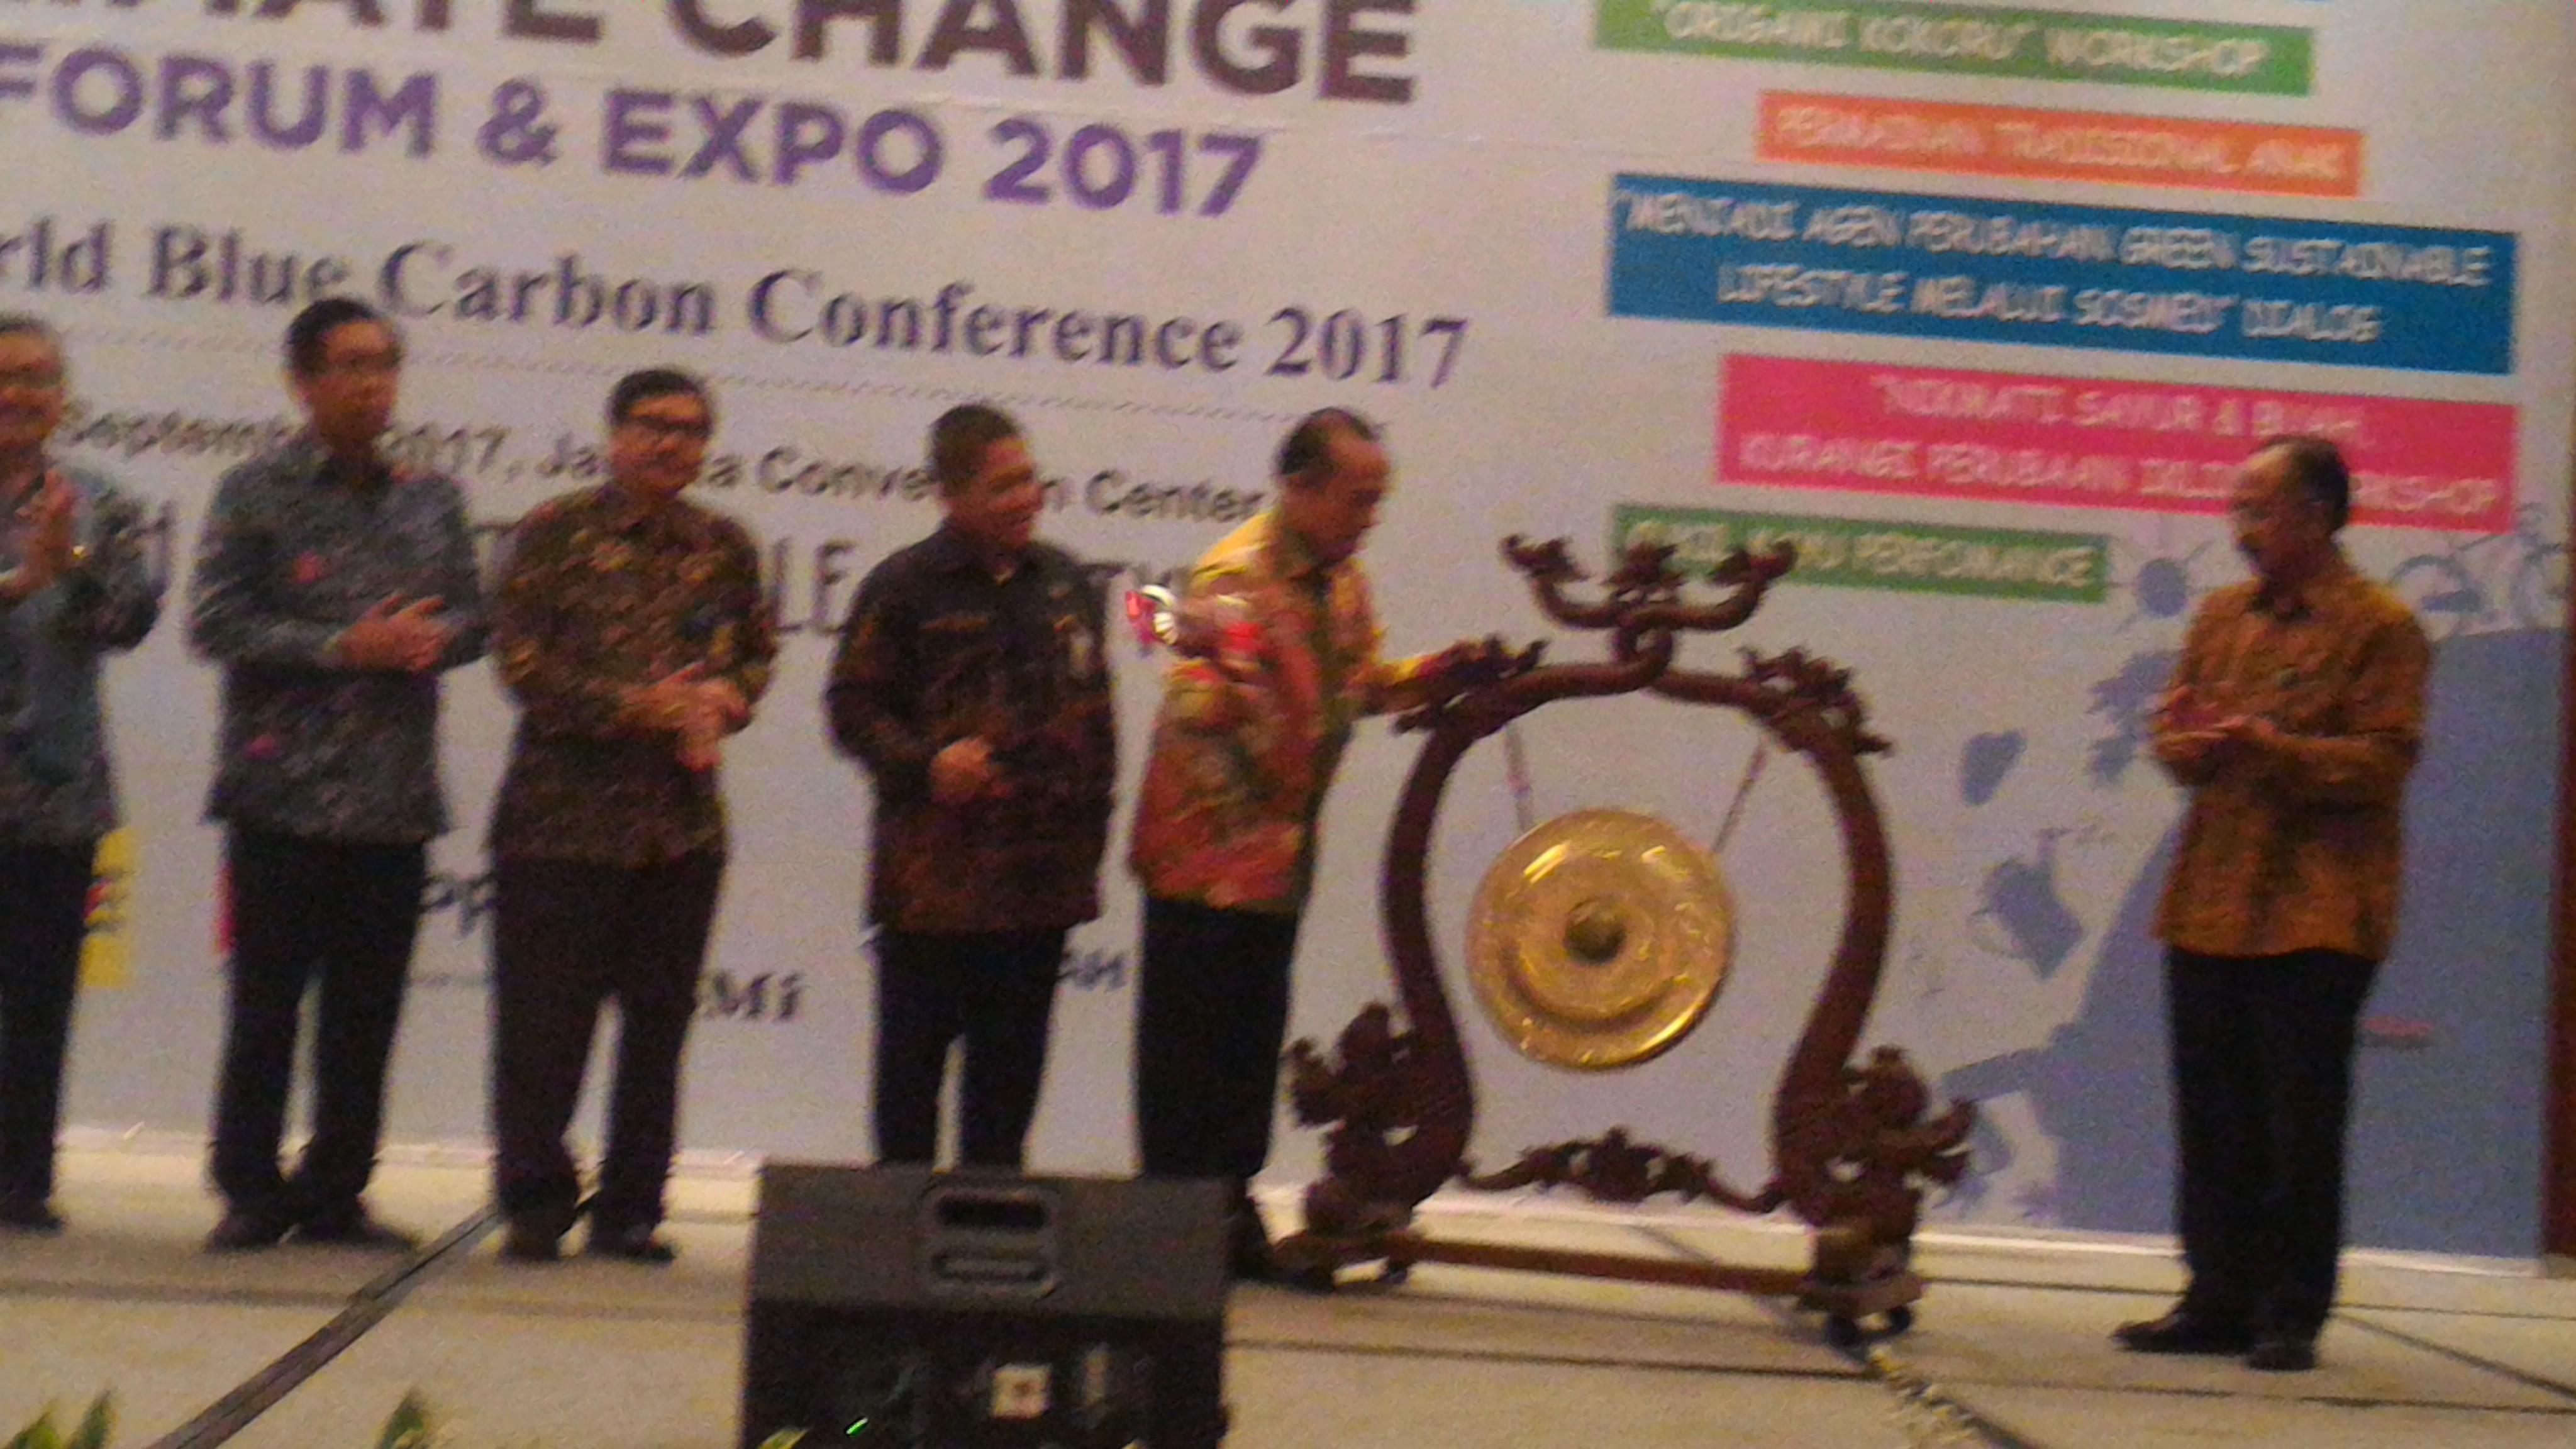 Indonesia Climate Change Forum & Expo Dibuka